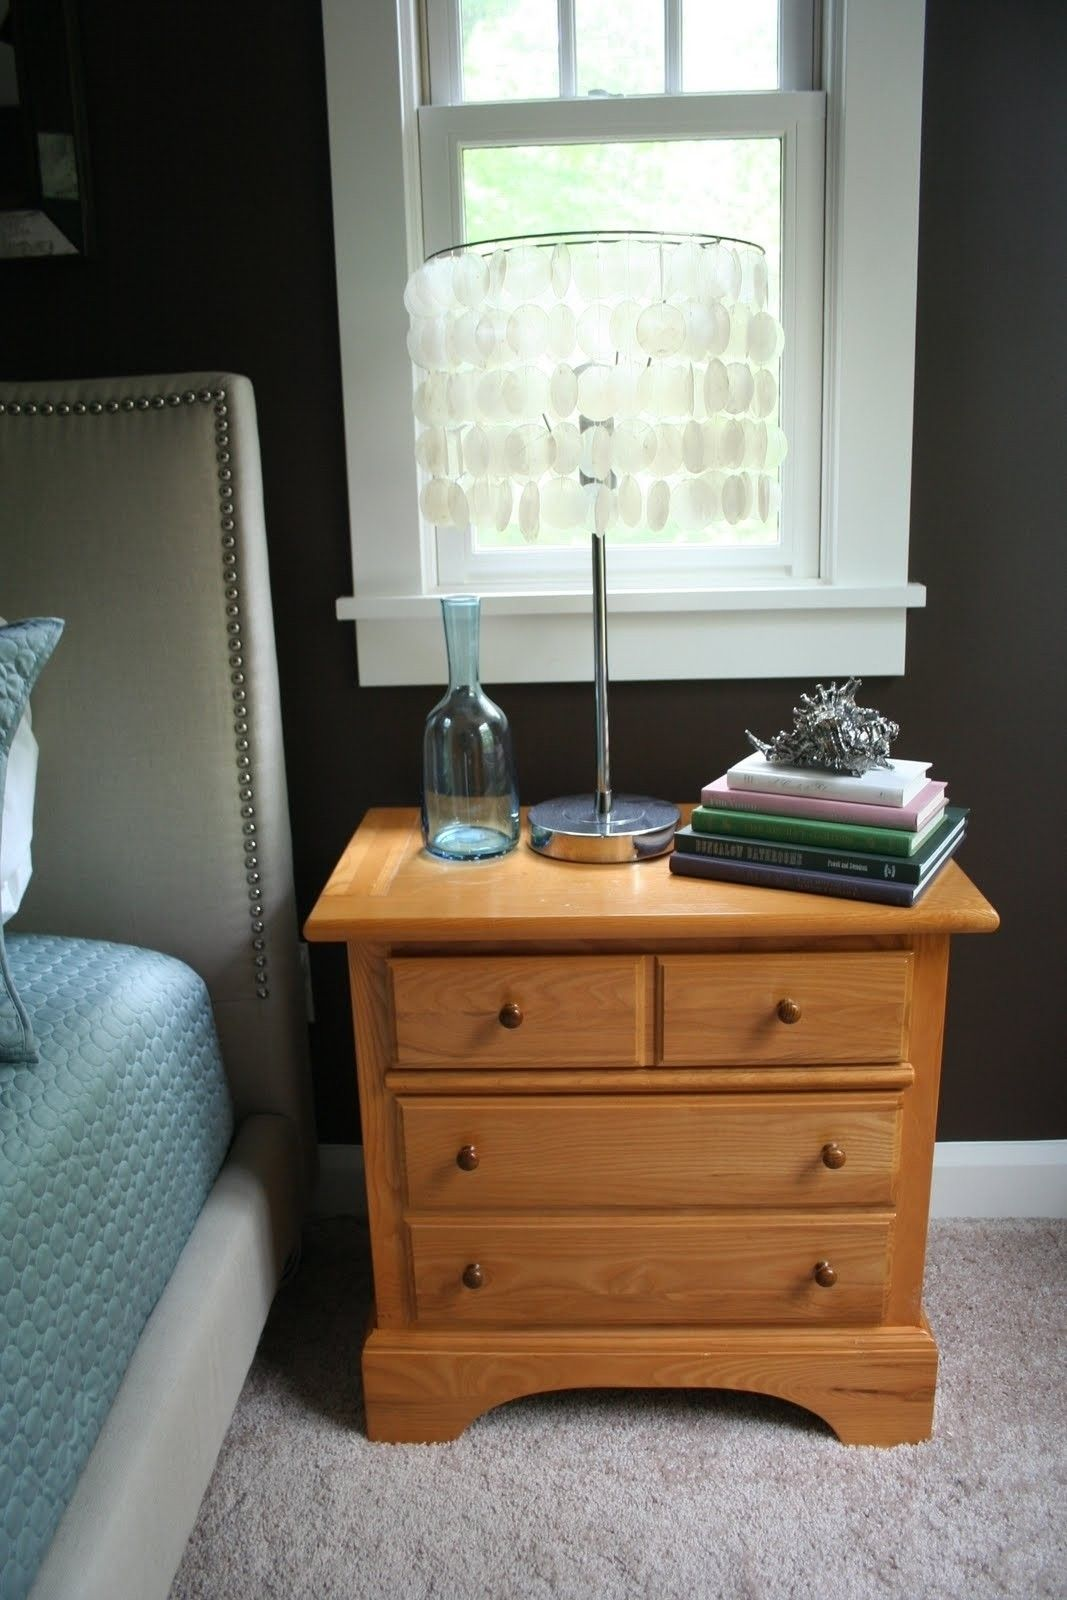 Furniture Glamorous Craigslist Phoenix Furnitureowner For